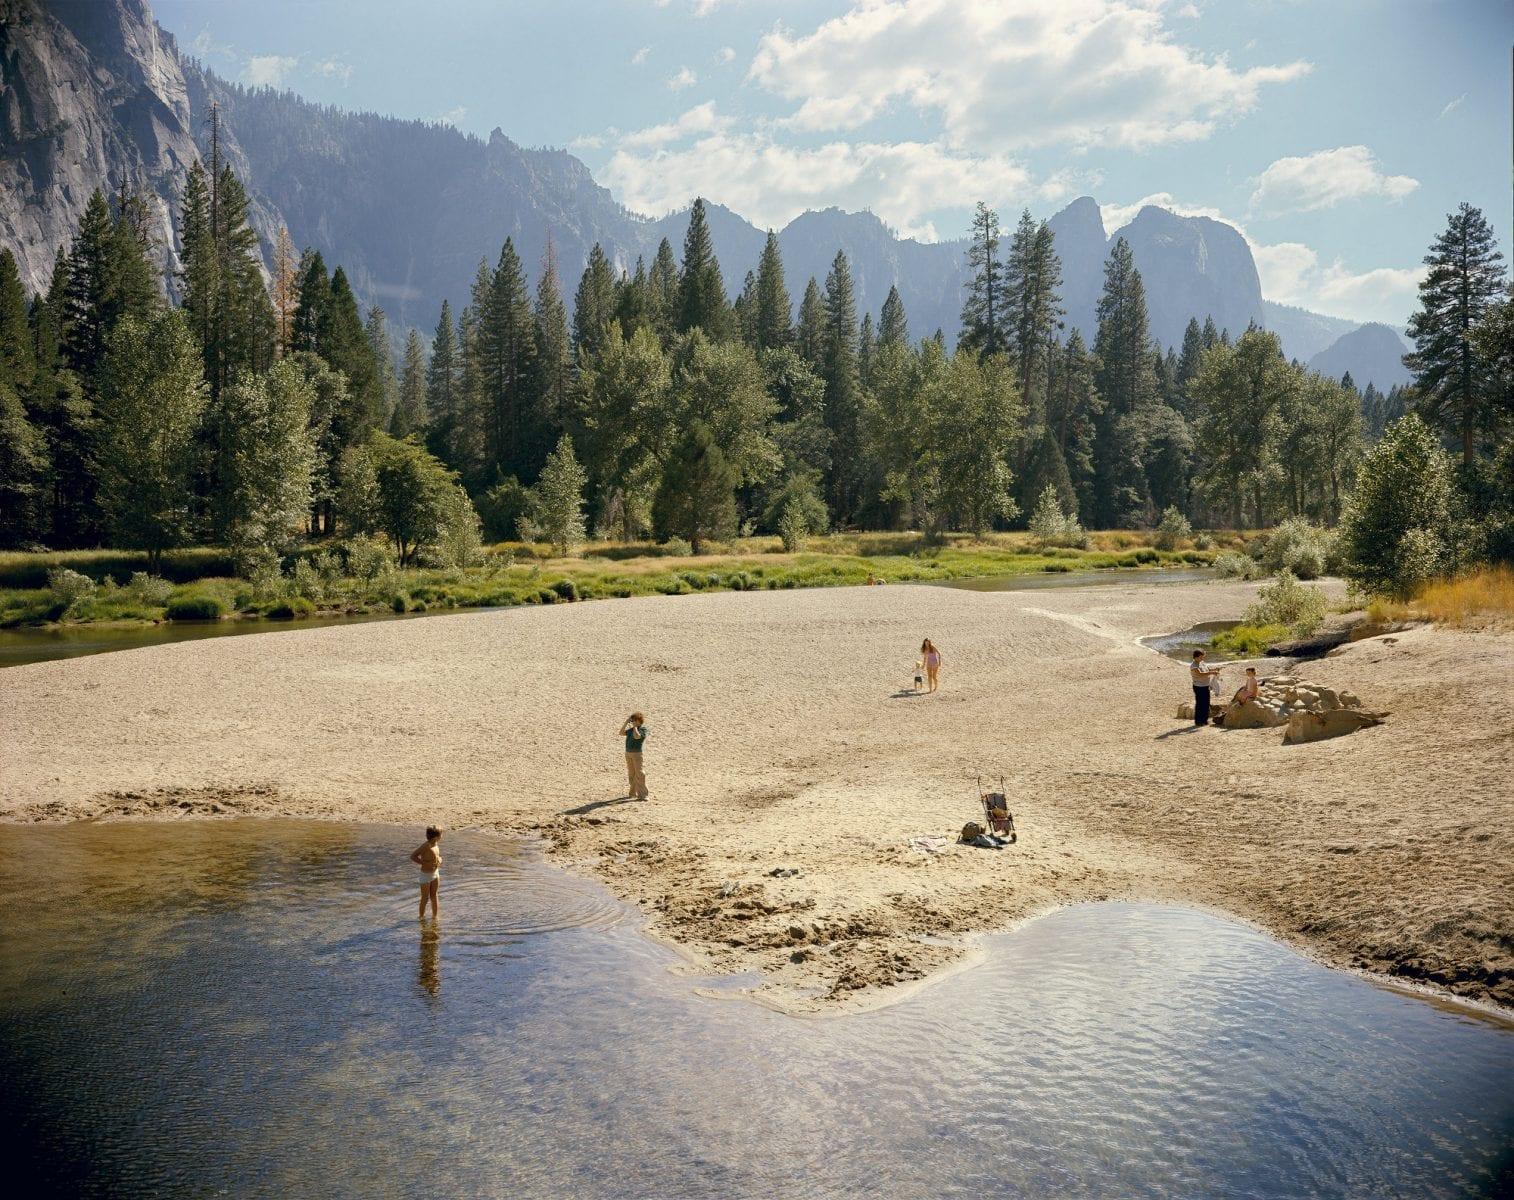 Merced River, Yosemite National Park, California, August 13, 1979 Stephen Shore